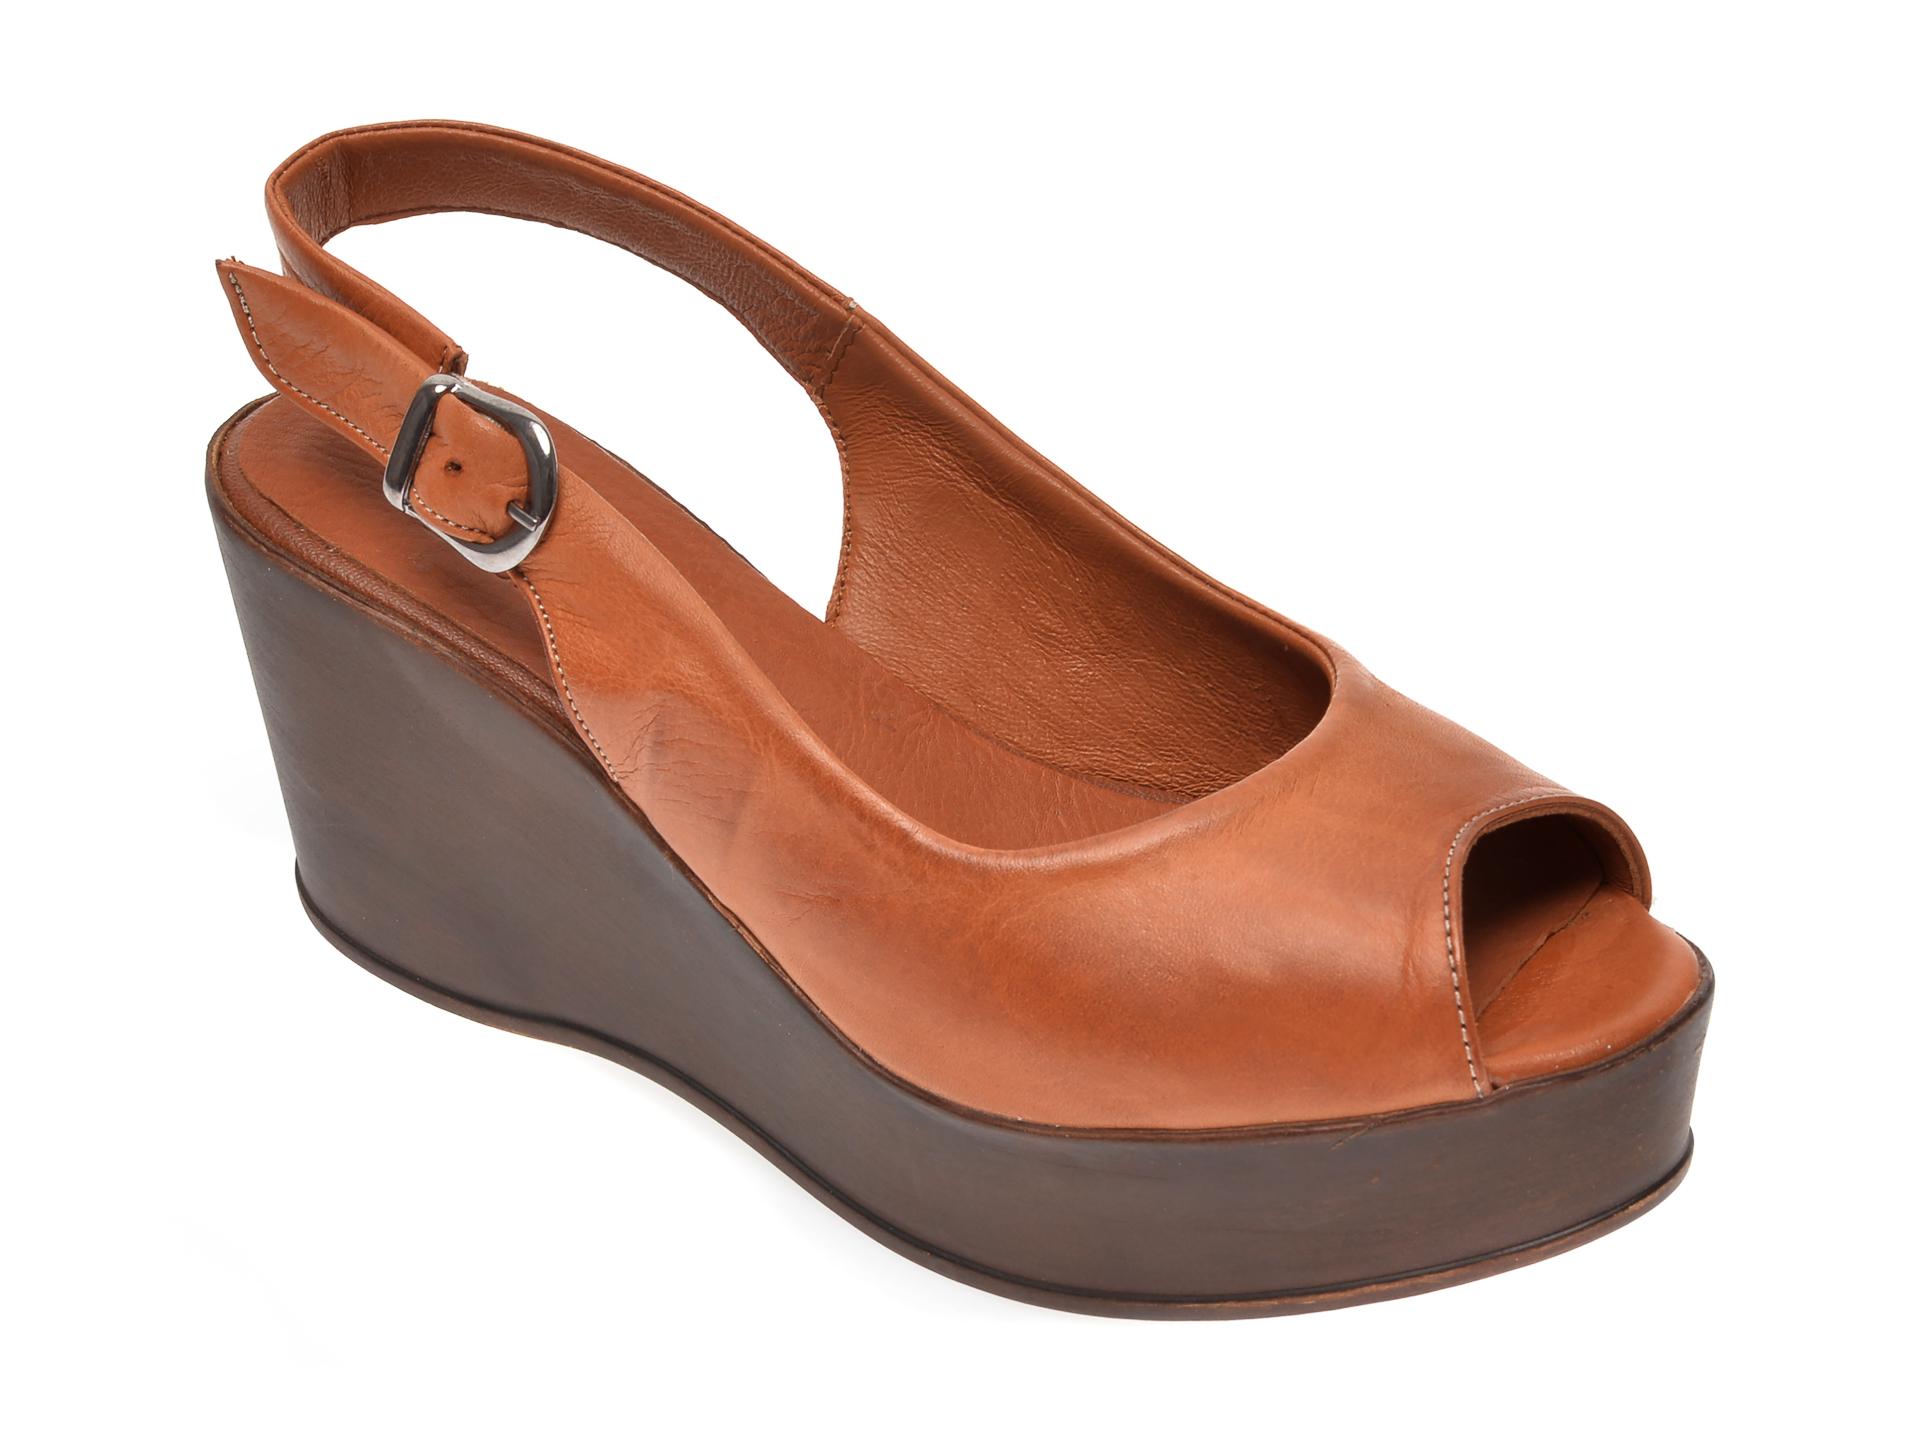 Sandale FLAVIA PASSINI maro, 1110, din piele naturala